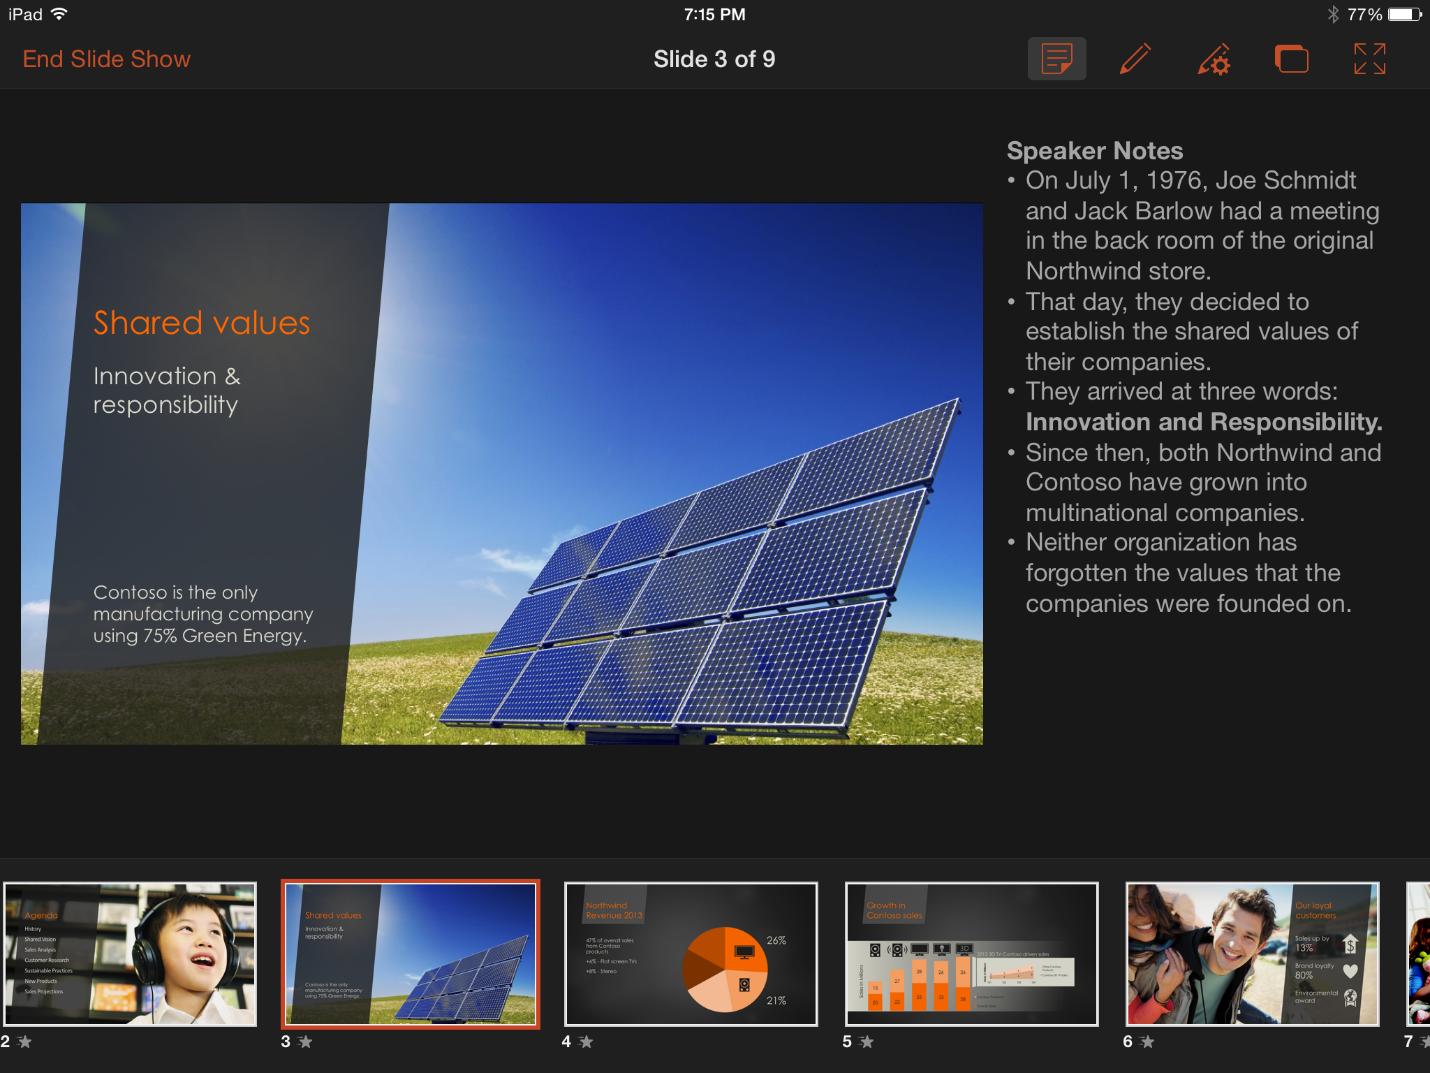 PowerPoint 1.1 for iiPad (Presenter View)